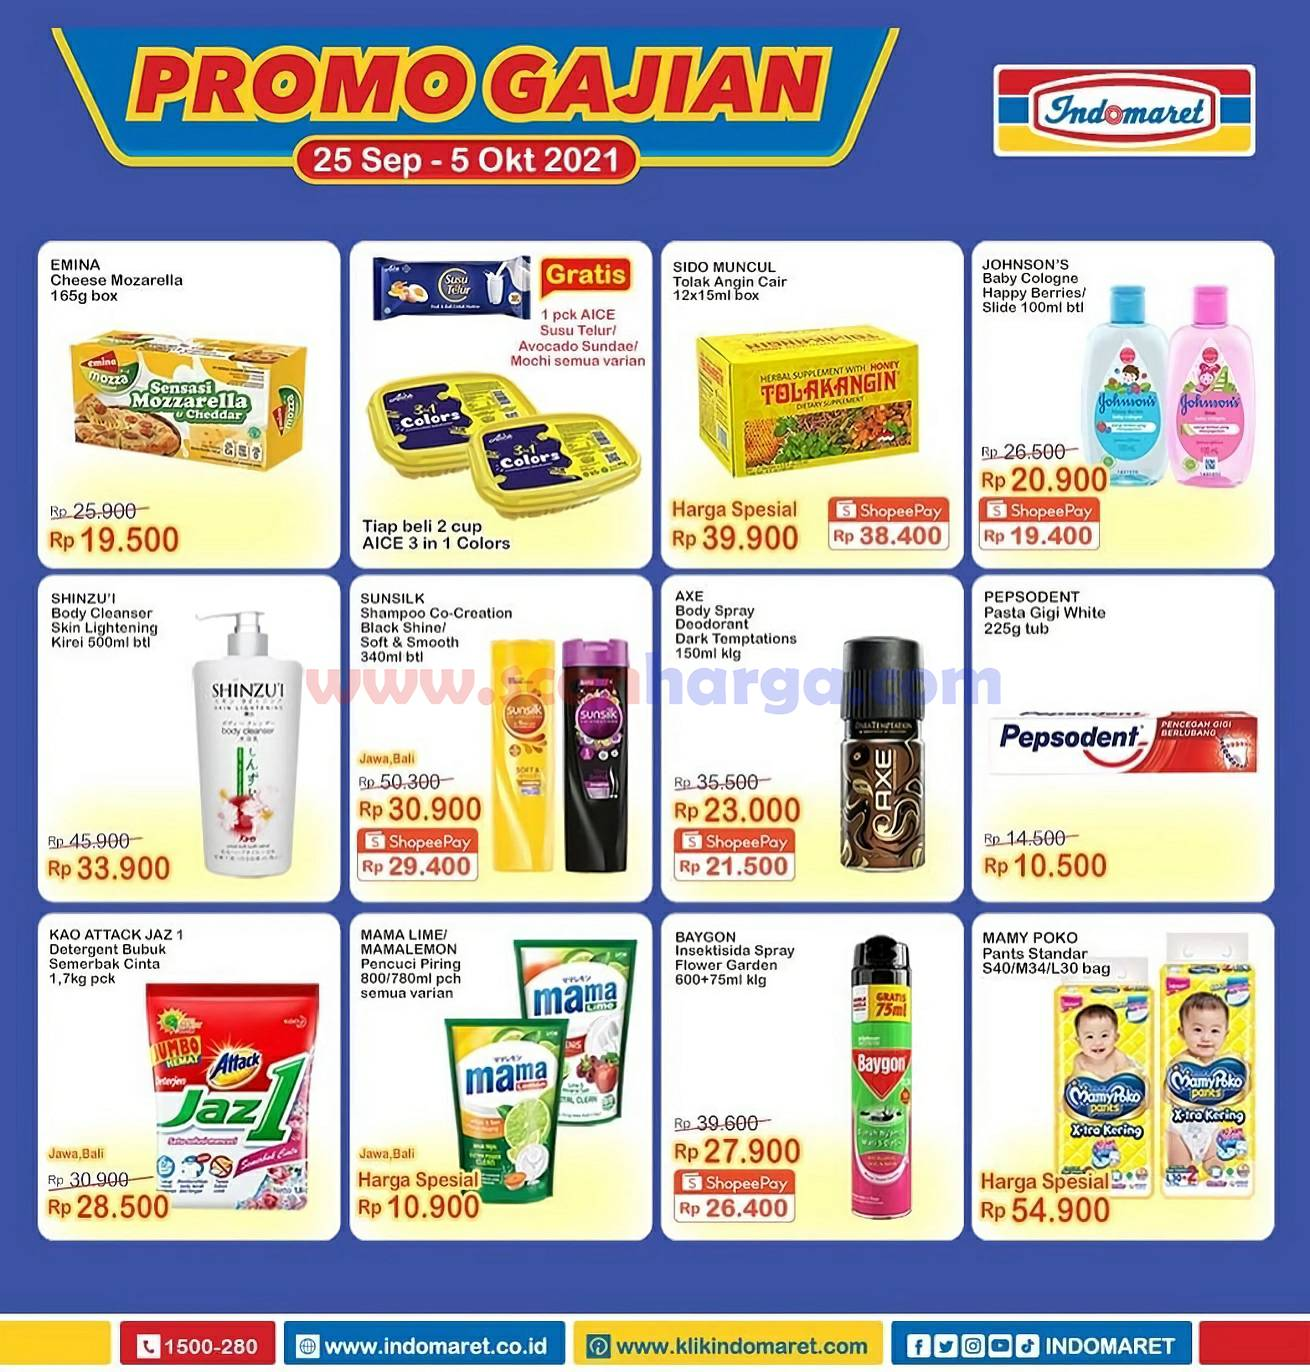 INDOMARET Promo GAJIAN Periode 25 September - 5 Oktober 2021 2